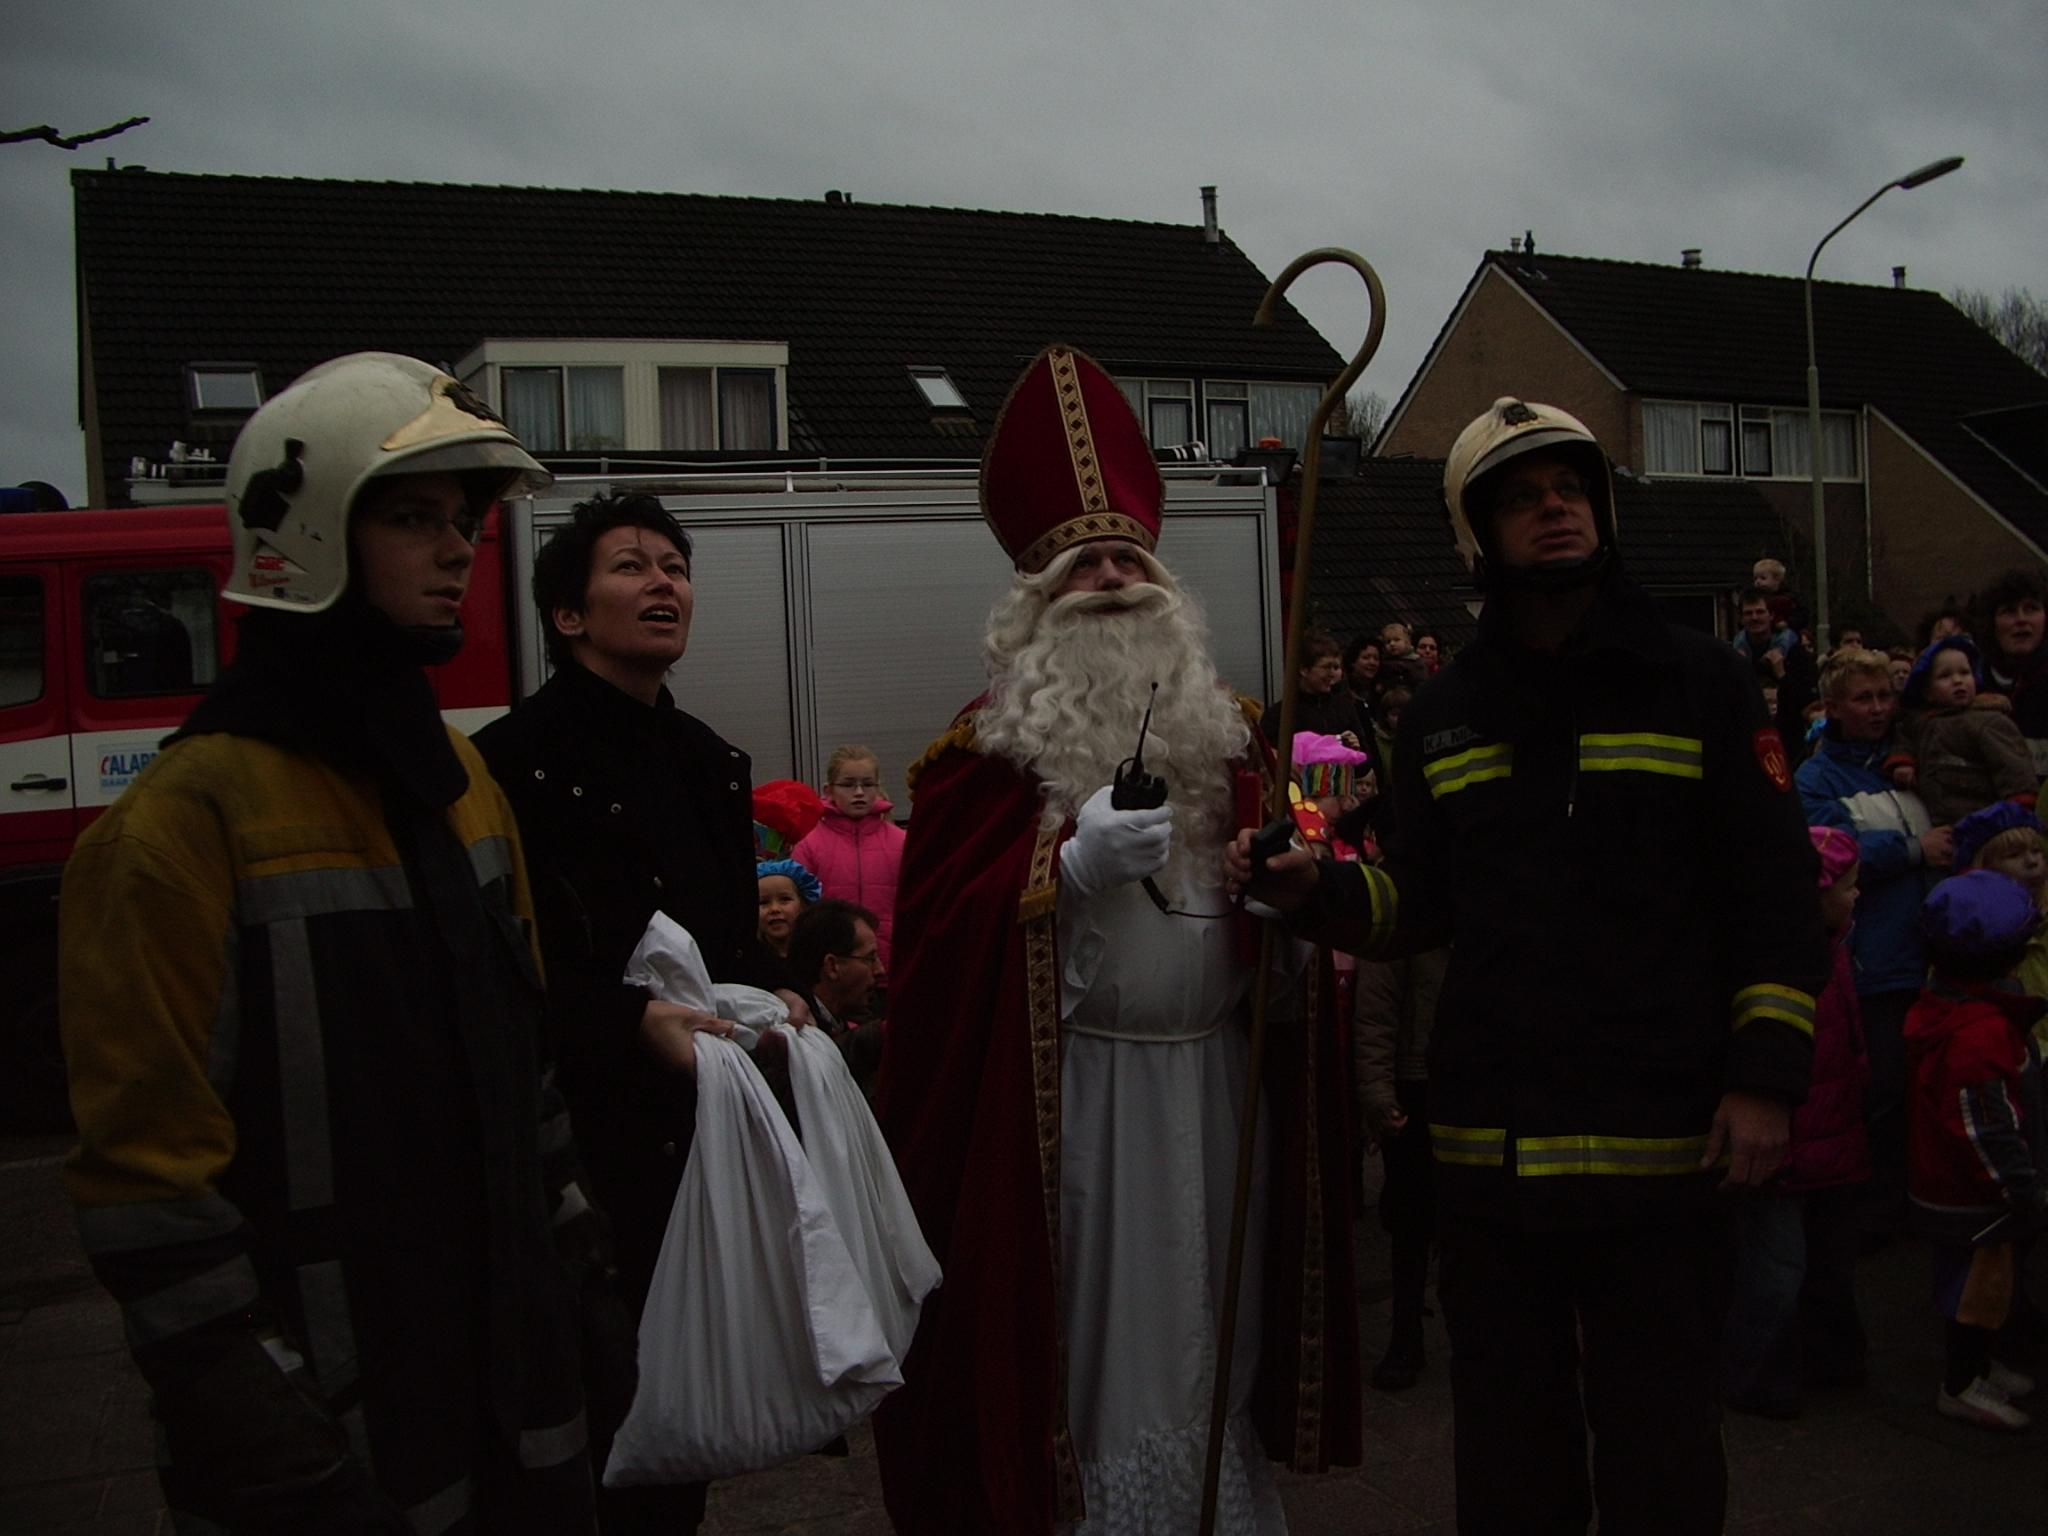 2006-12-05 binnenhalen sinterklaas school Onstwedde